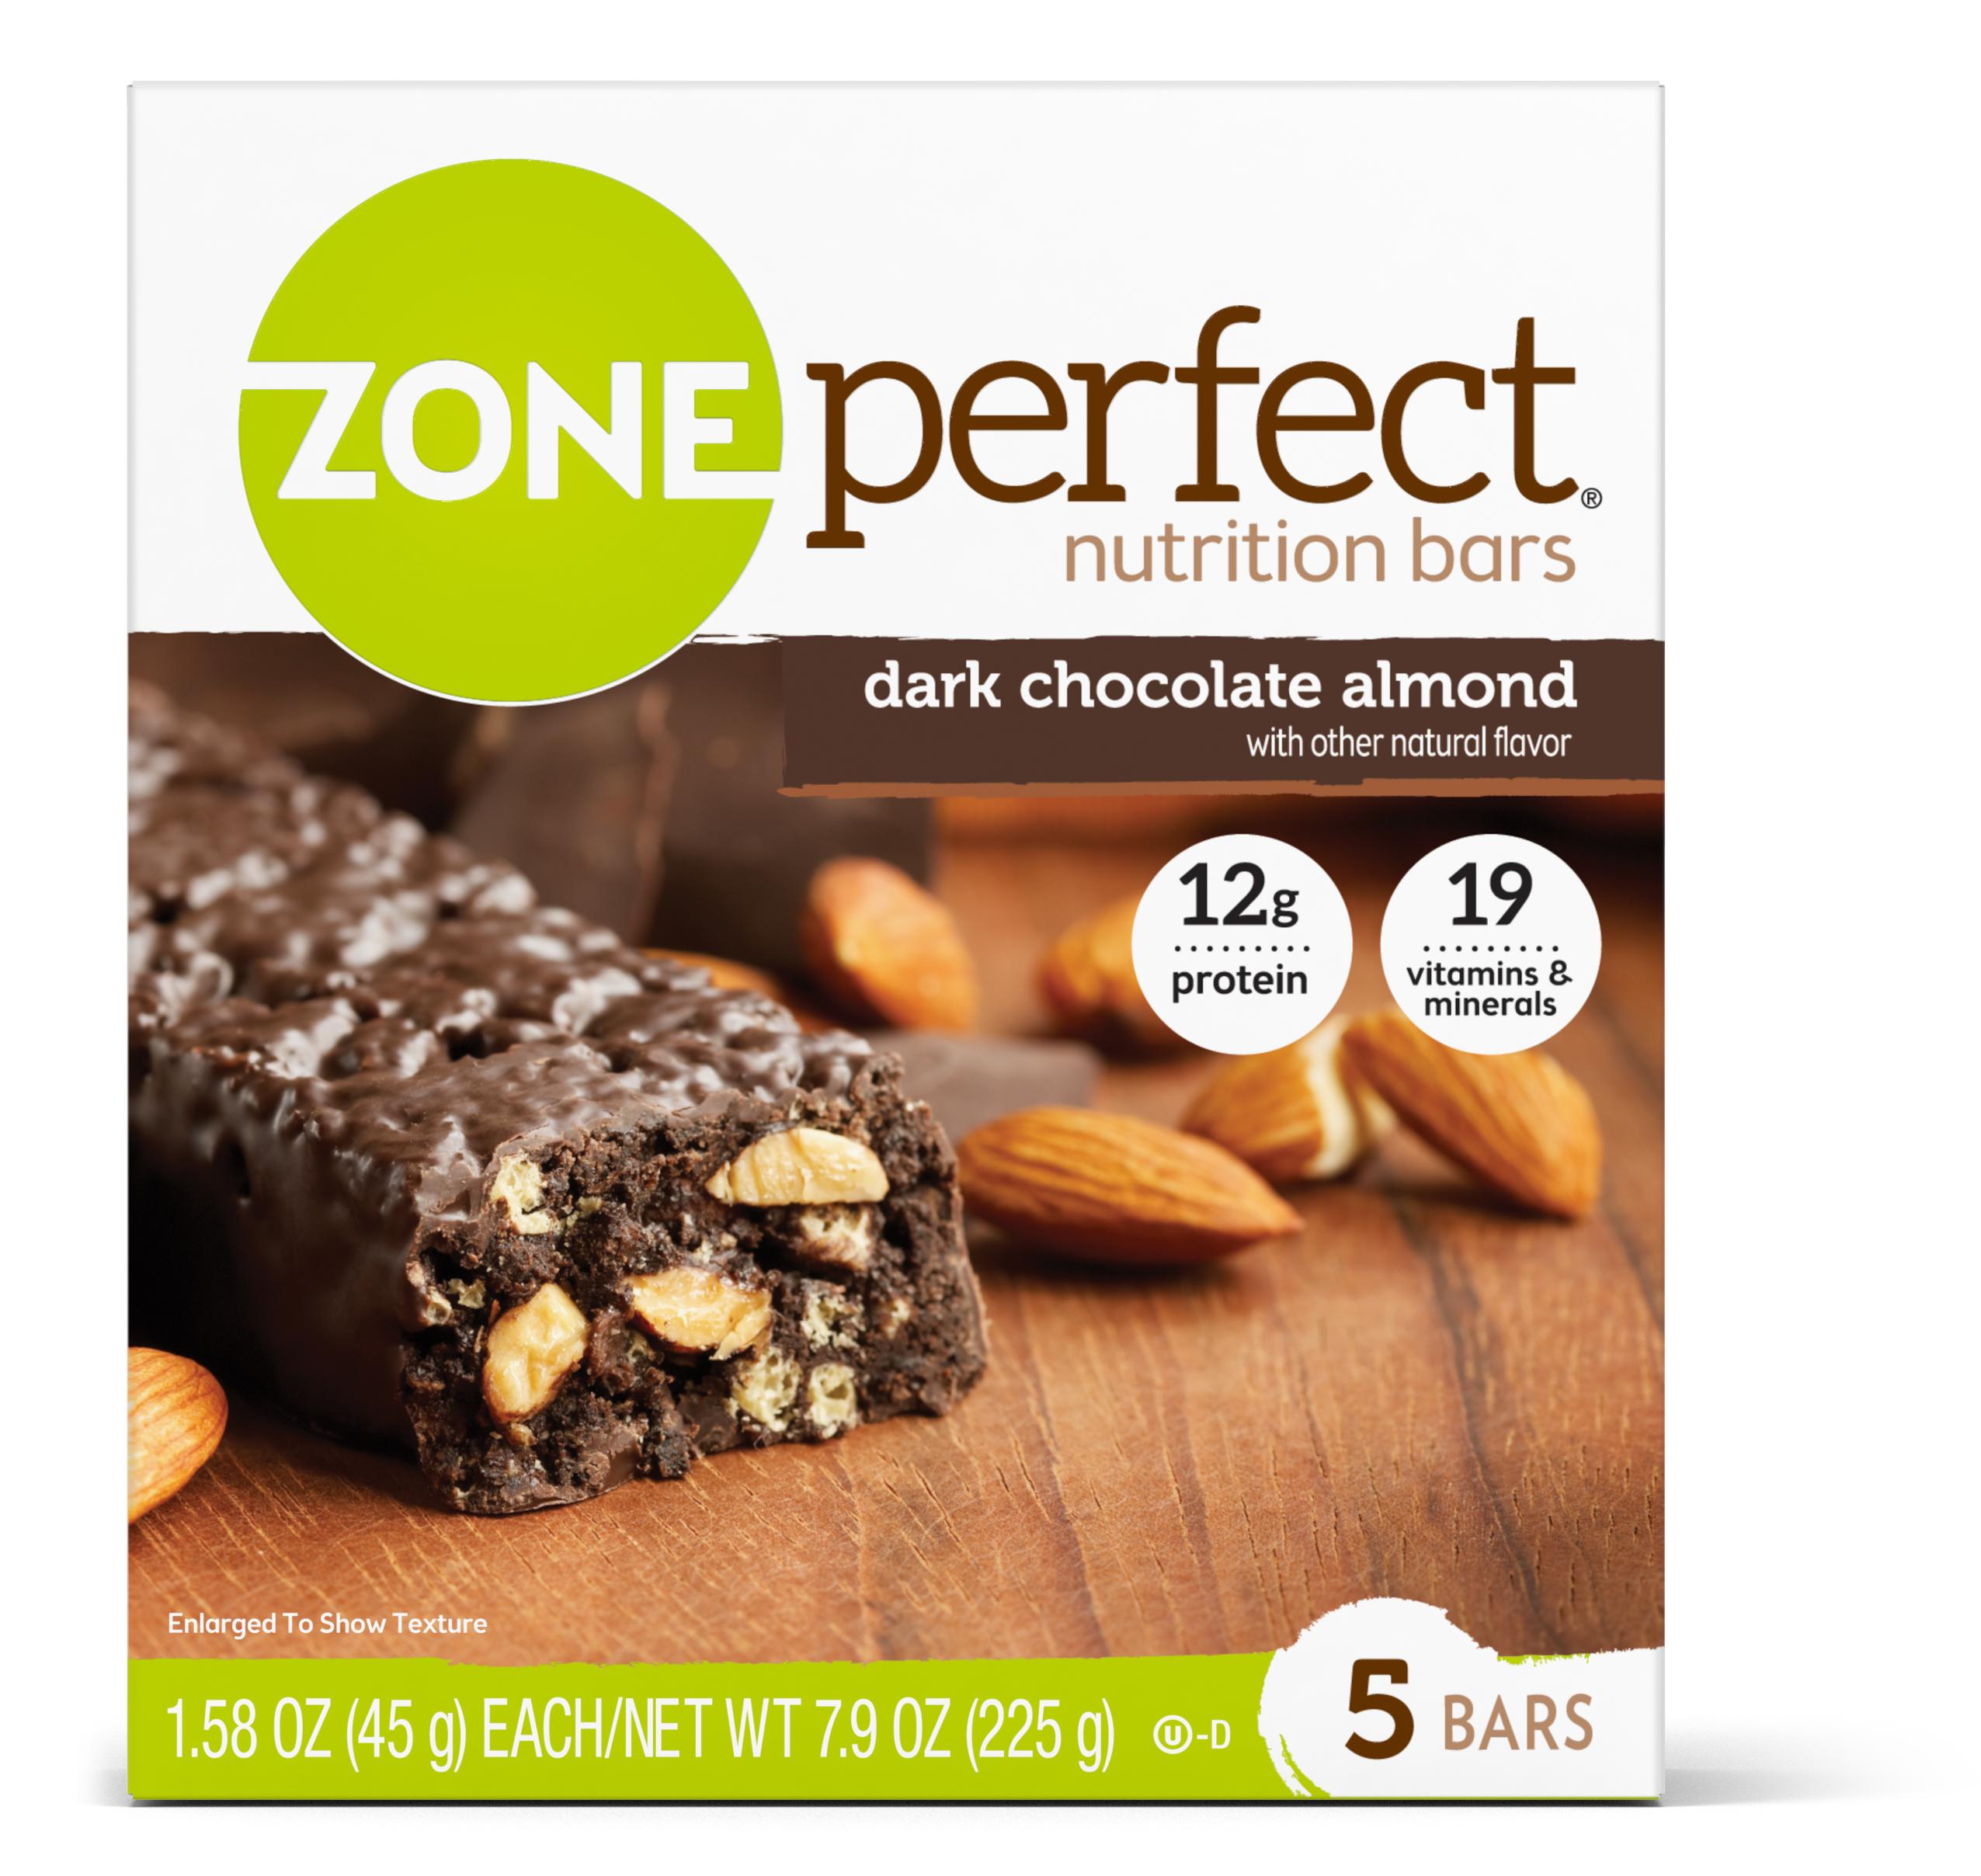 Zone Perfect Nutrition Snack Bar, Dark Chocolate Almond, 12g Protein, 5 Ct